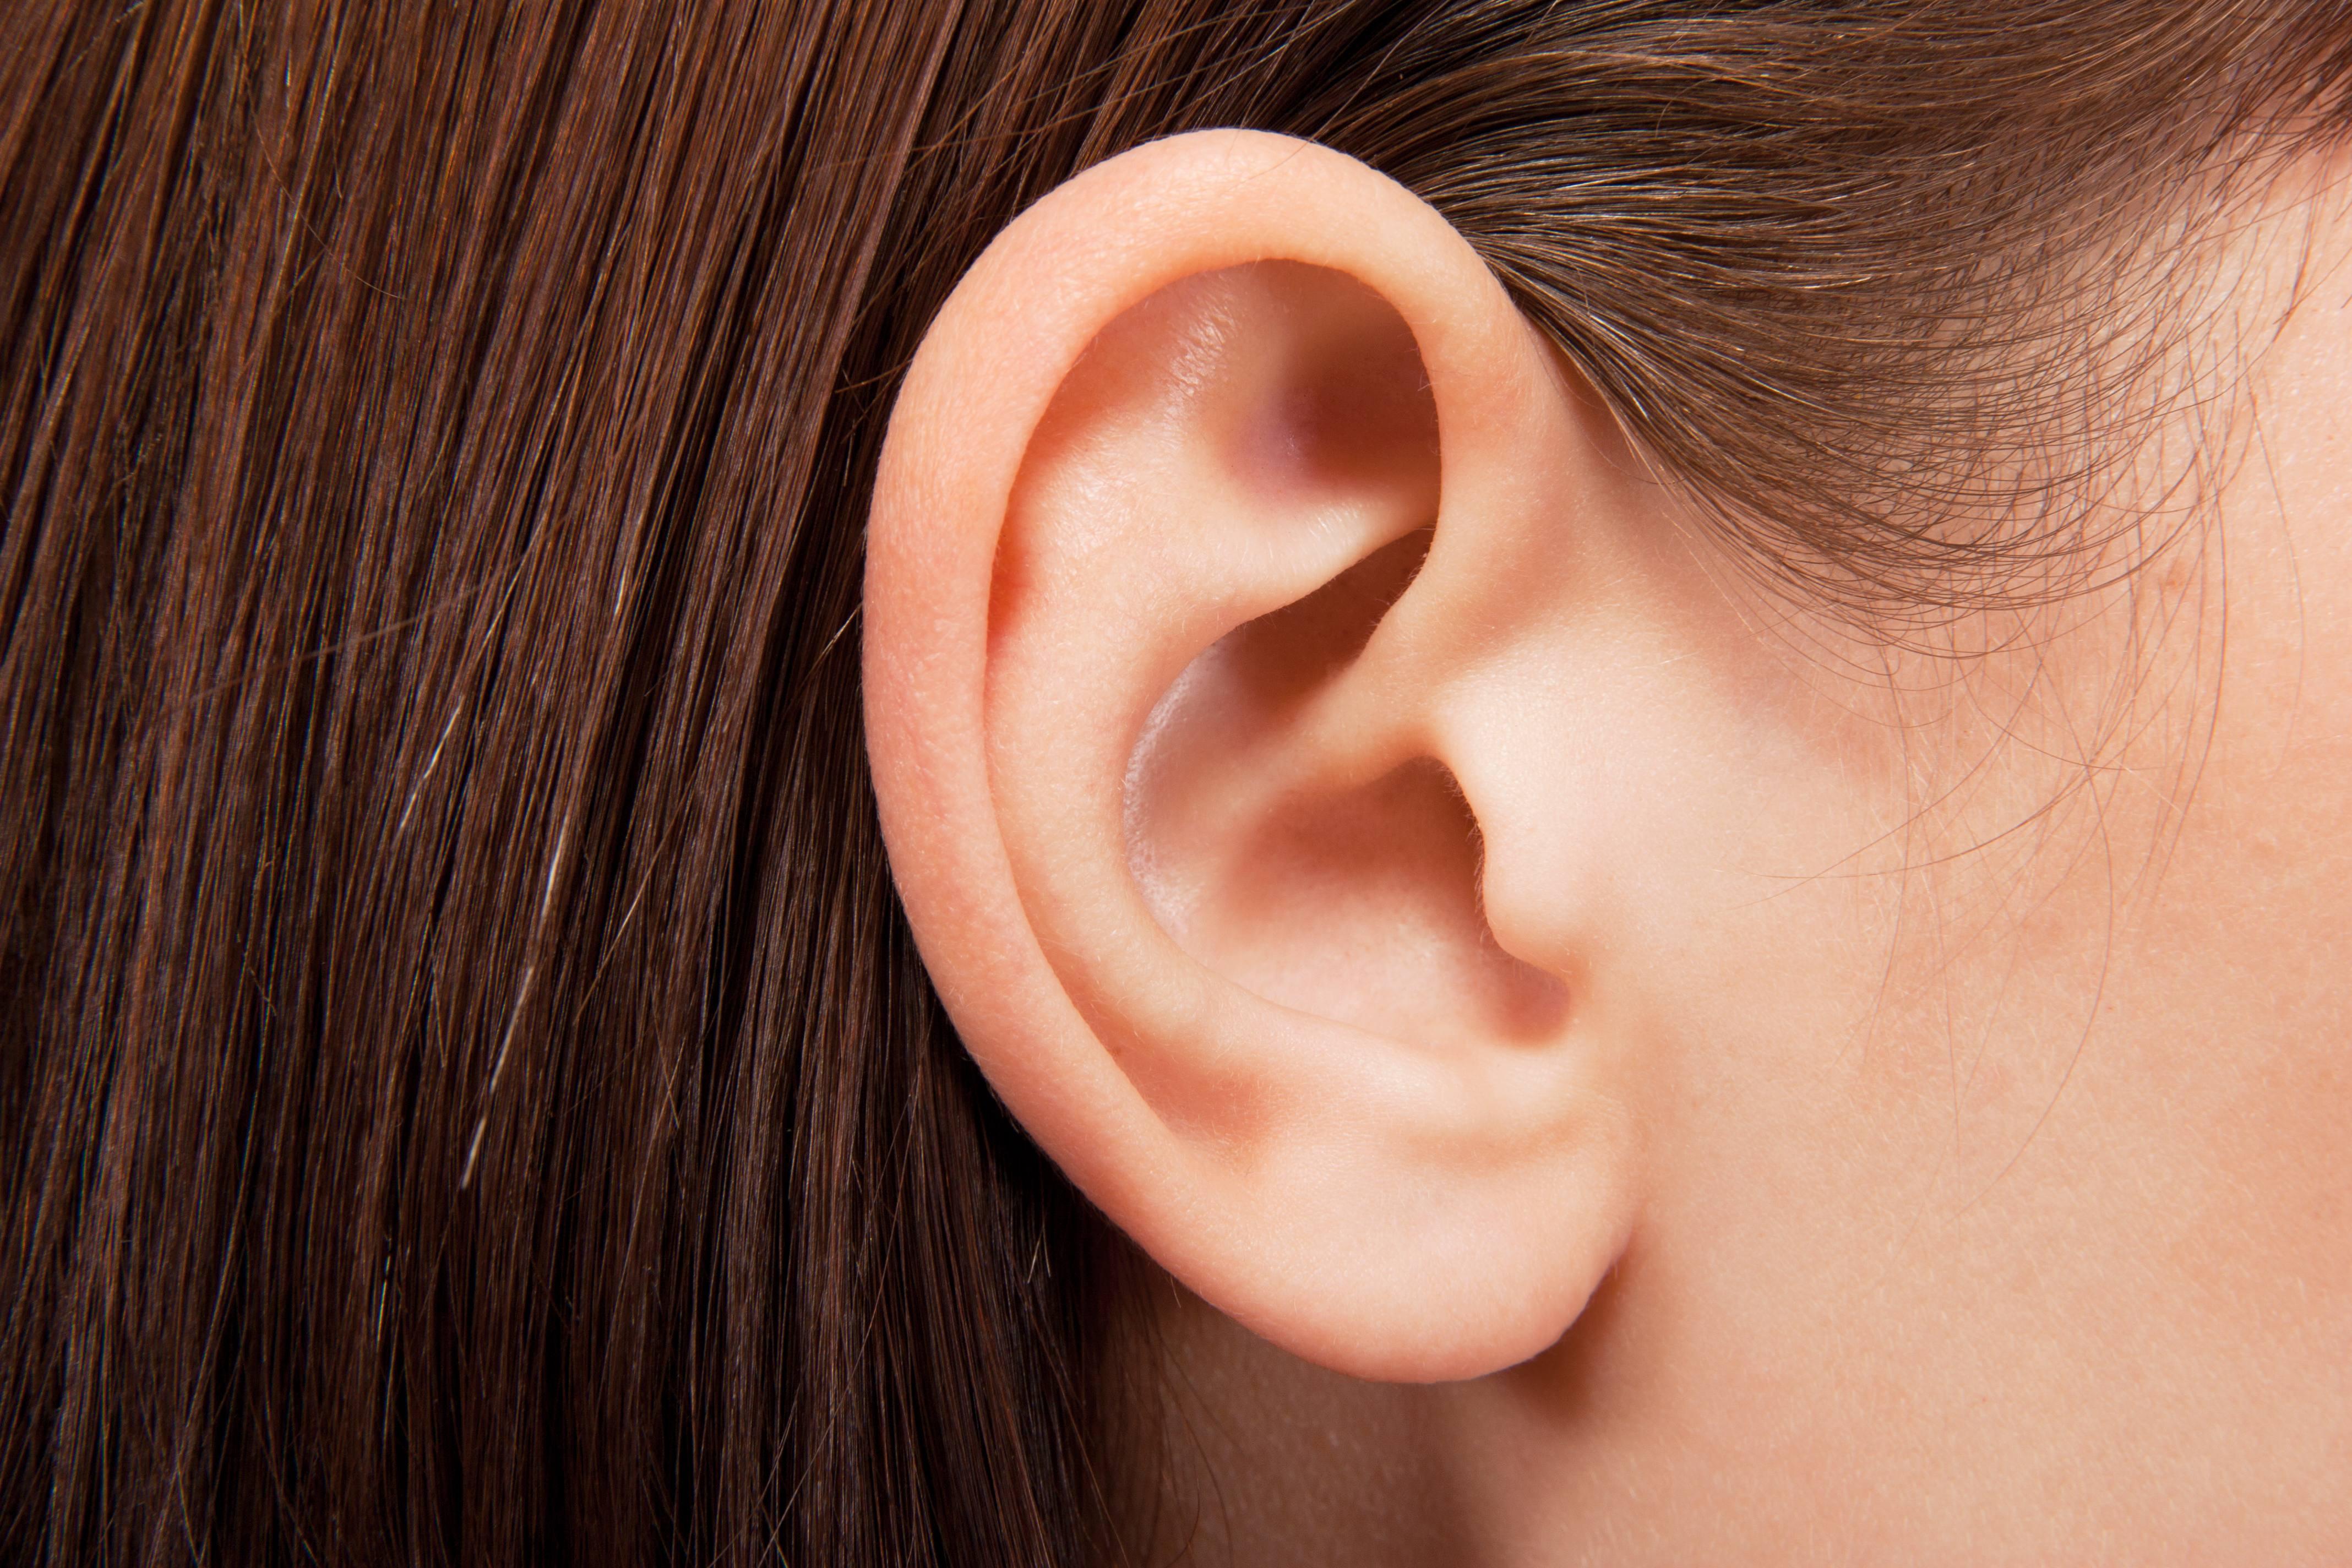 a closeup of a young girl's ear